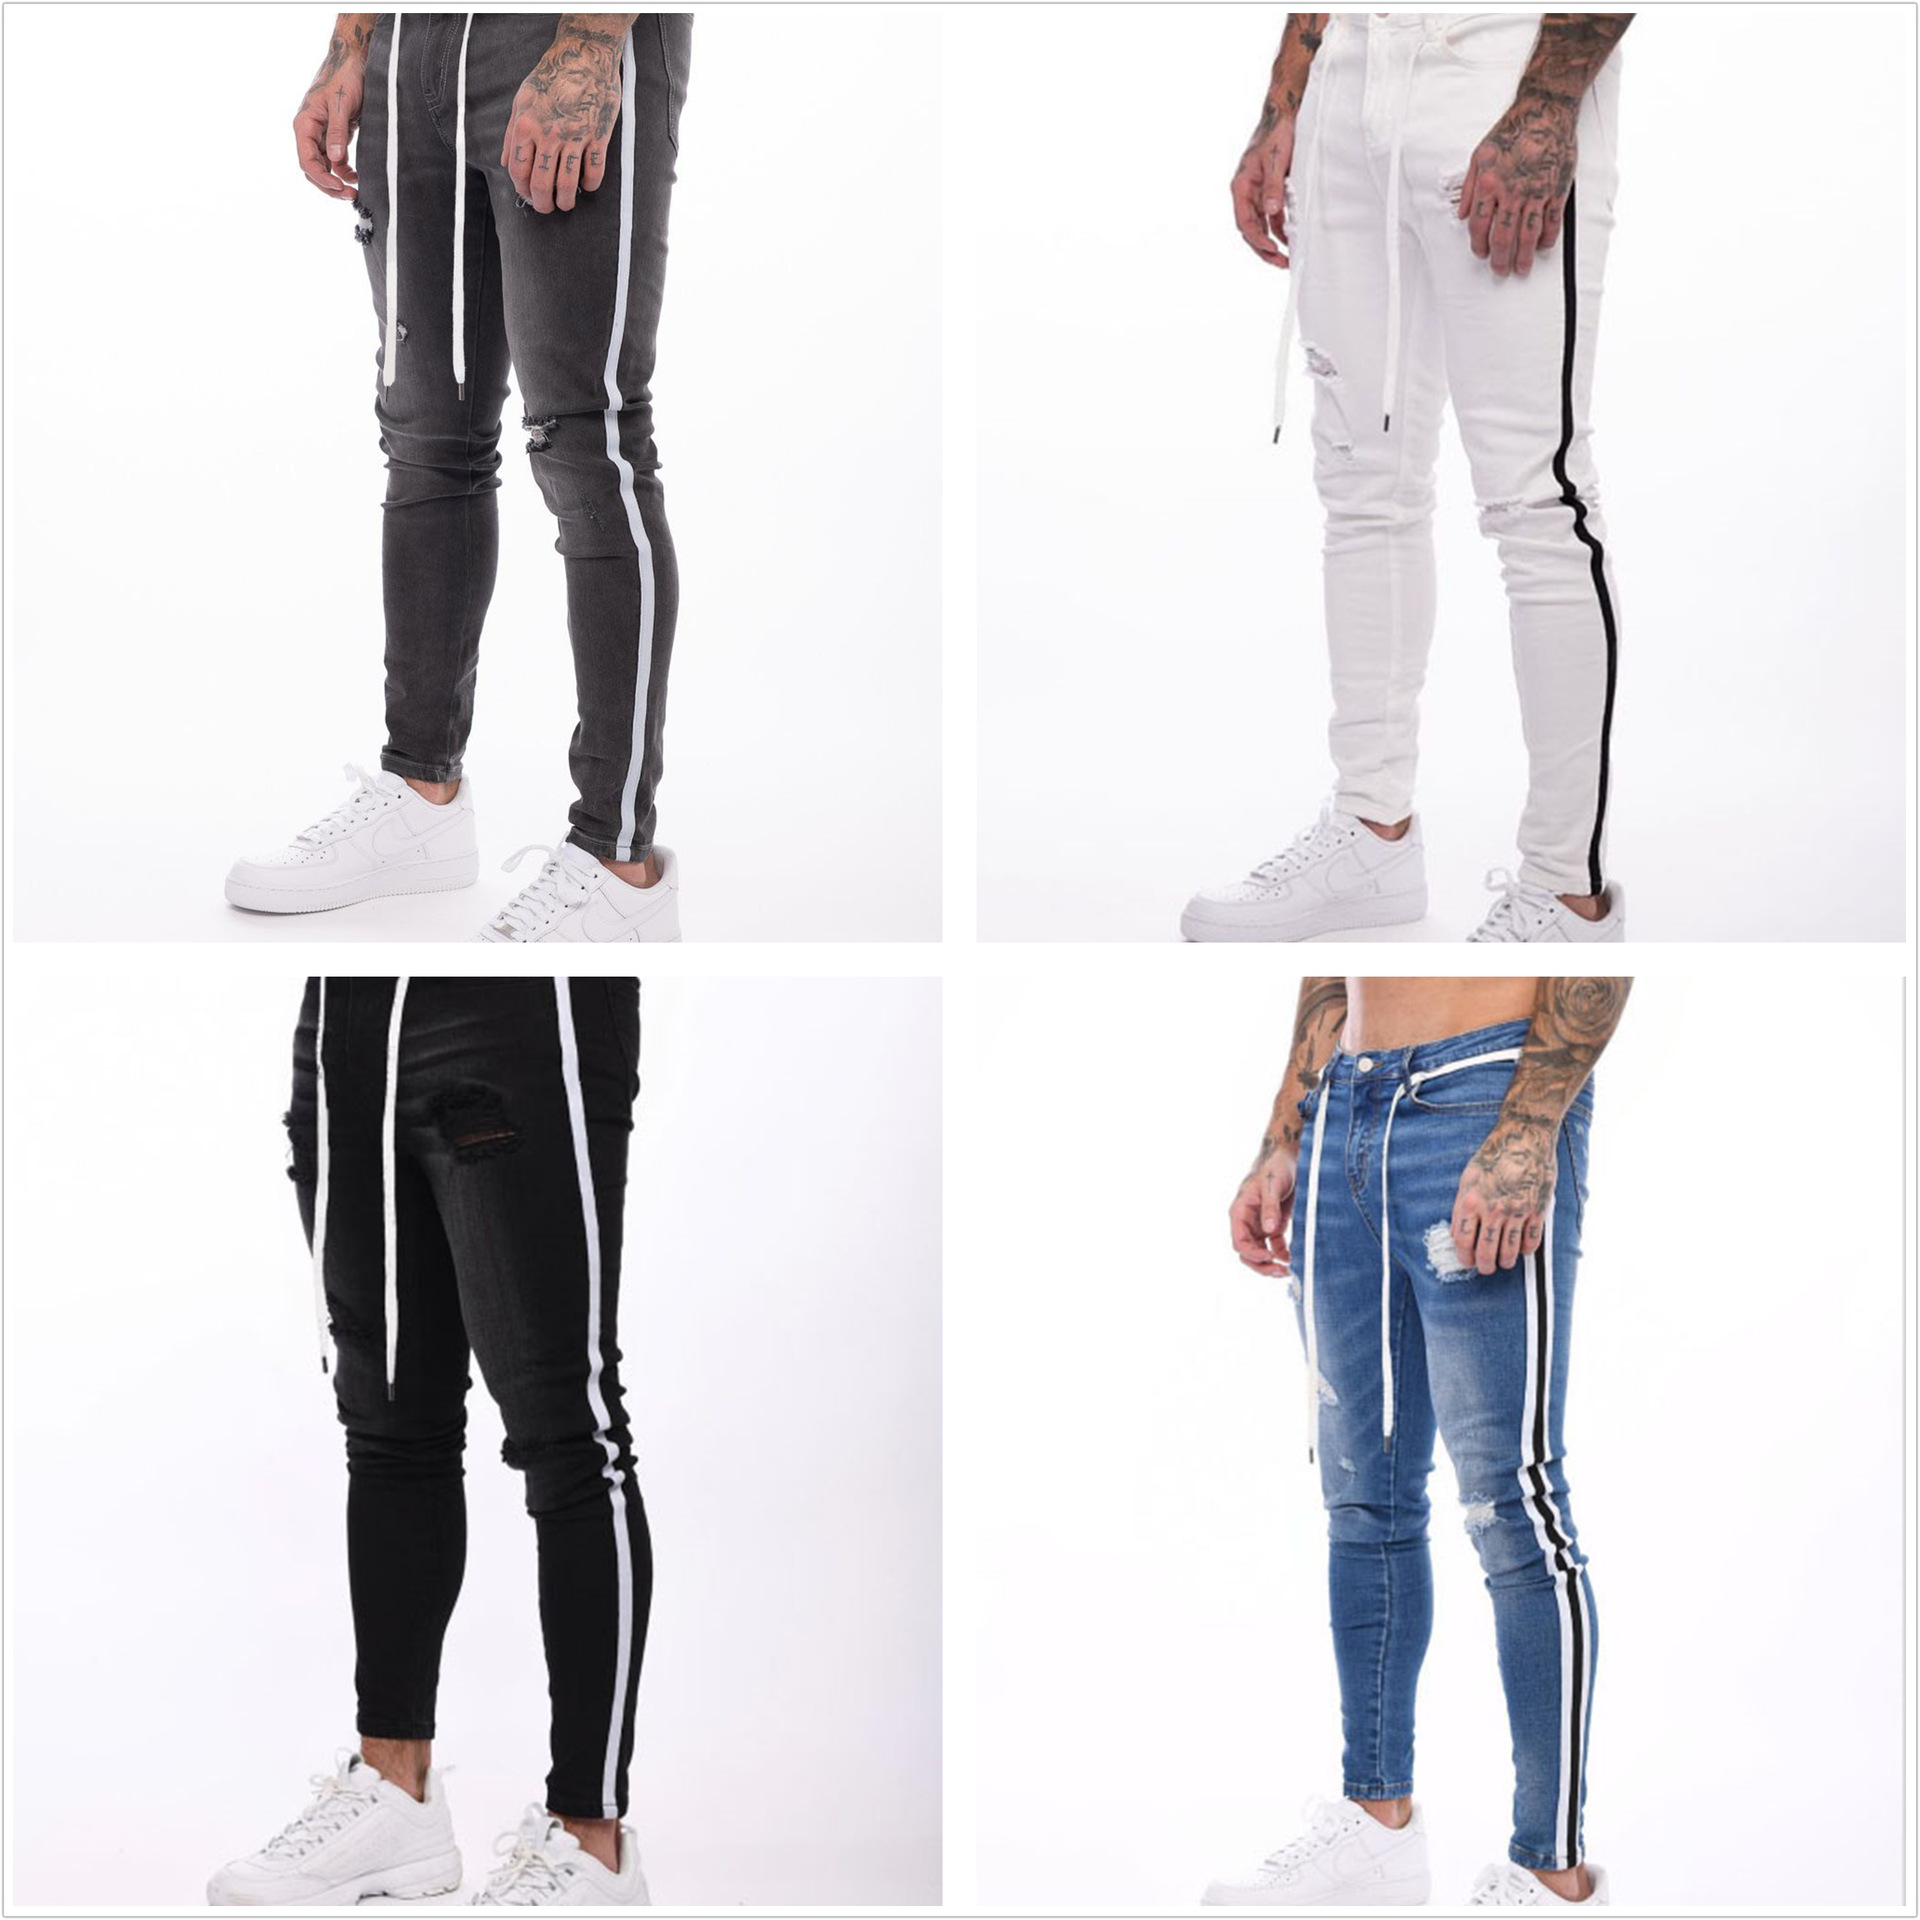 Men's Skinny Stretch Ripped Jeans HipHop Distressed Skinny Slim Fit Jean Pants Damaged Denim Pants Street ropa de hombre jeans